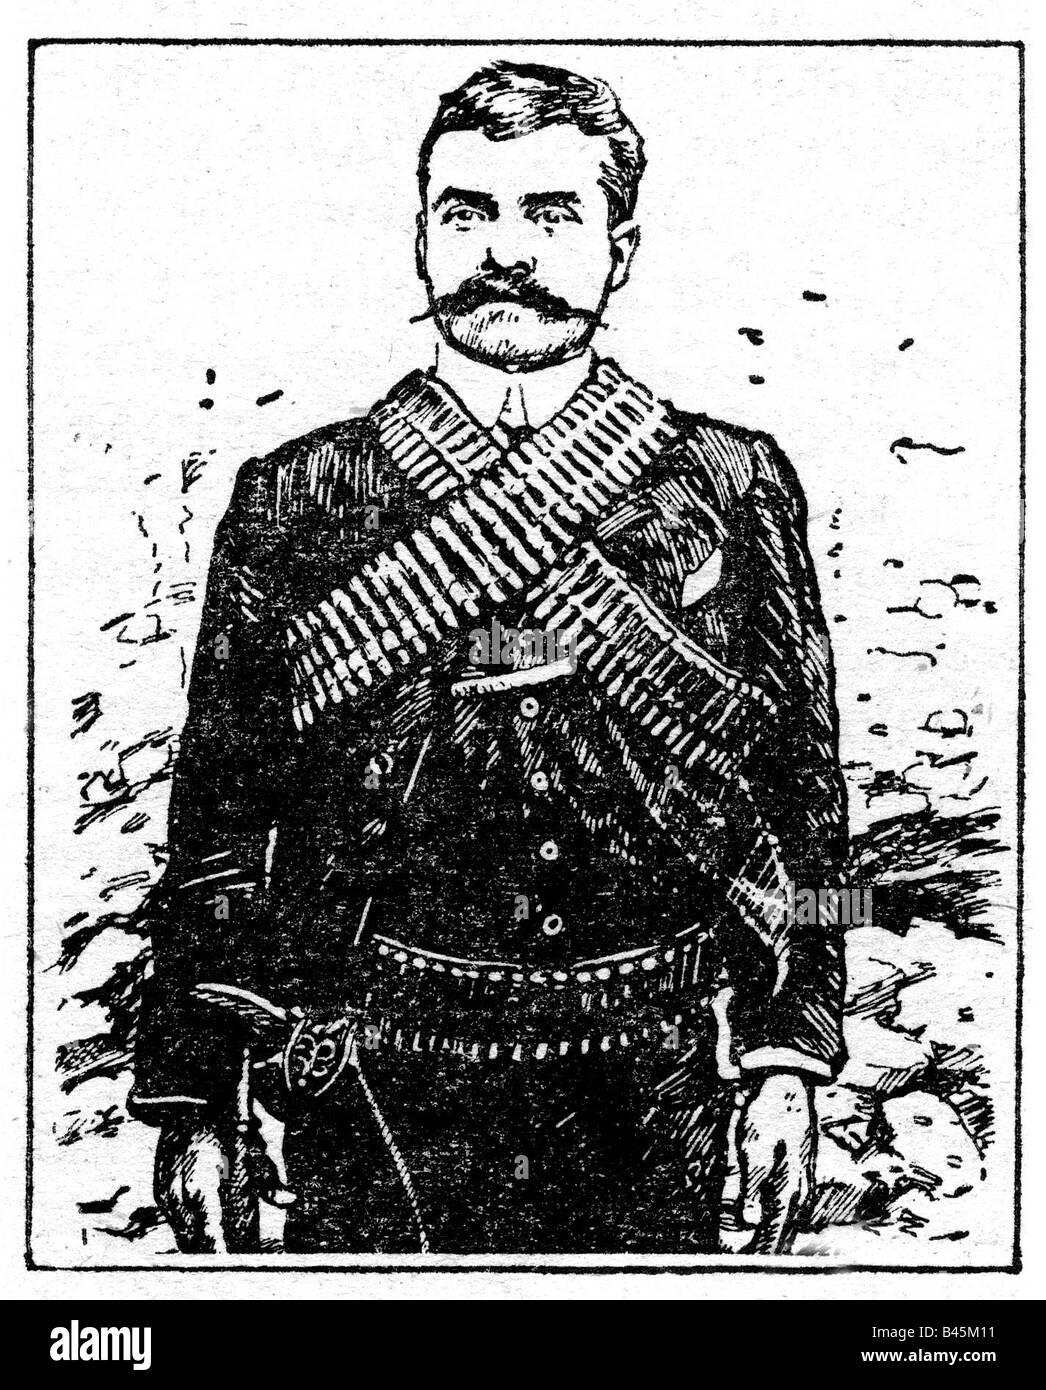 Emiliano Zapata Drawings